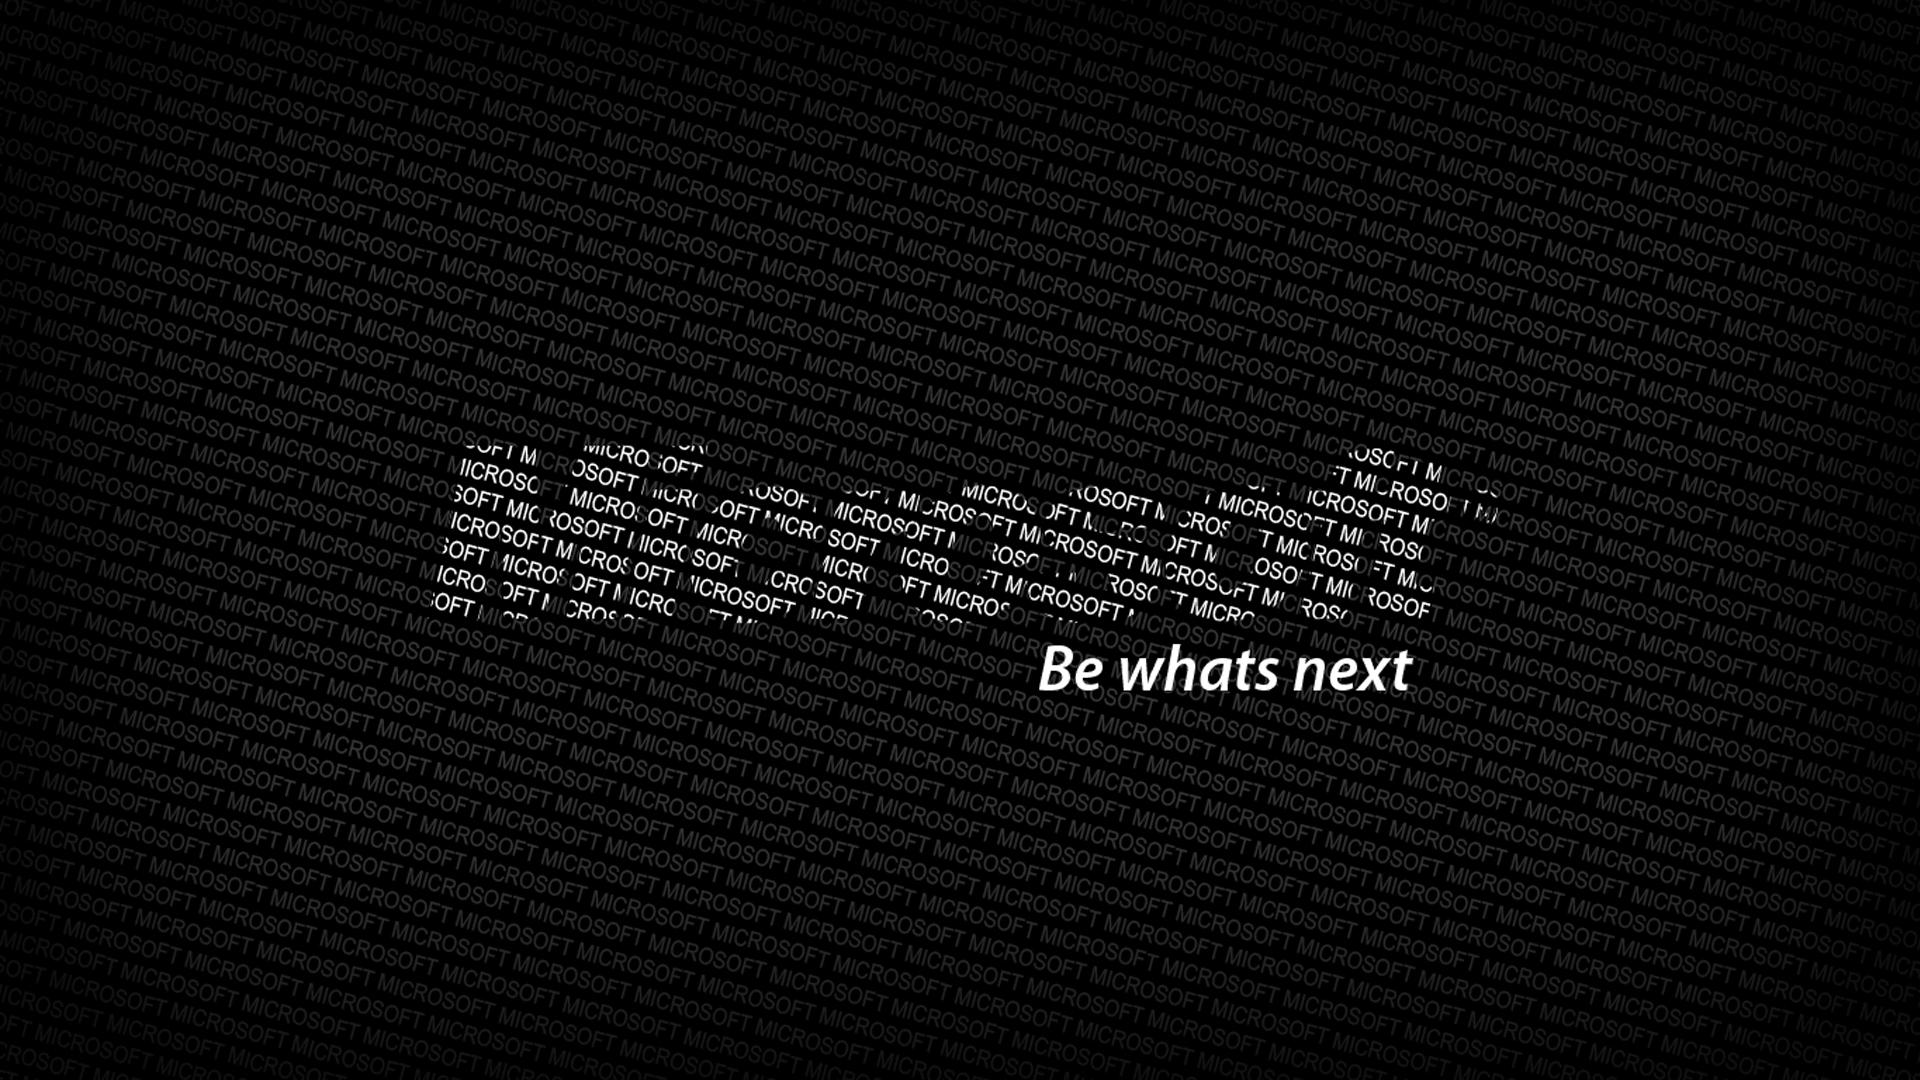 Microsoft Desktop Wallpaper Backgrounds 1920x1080